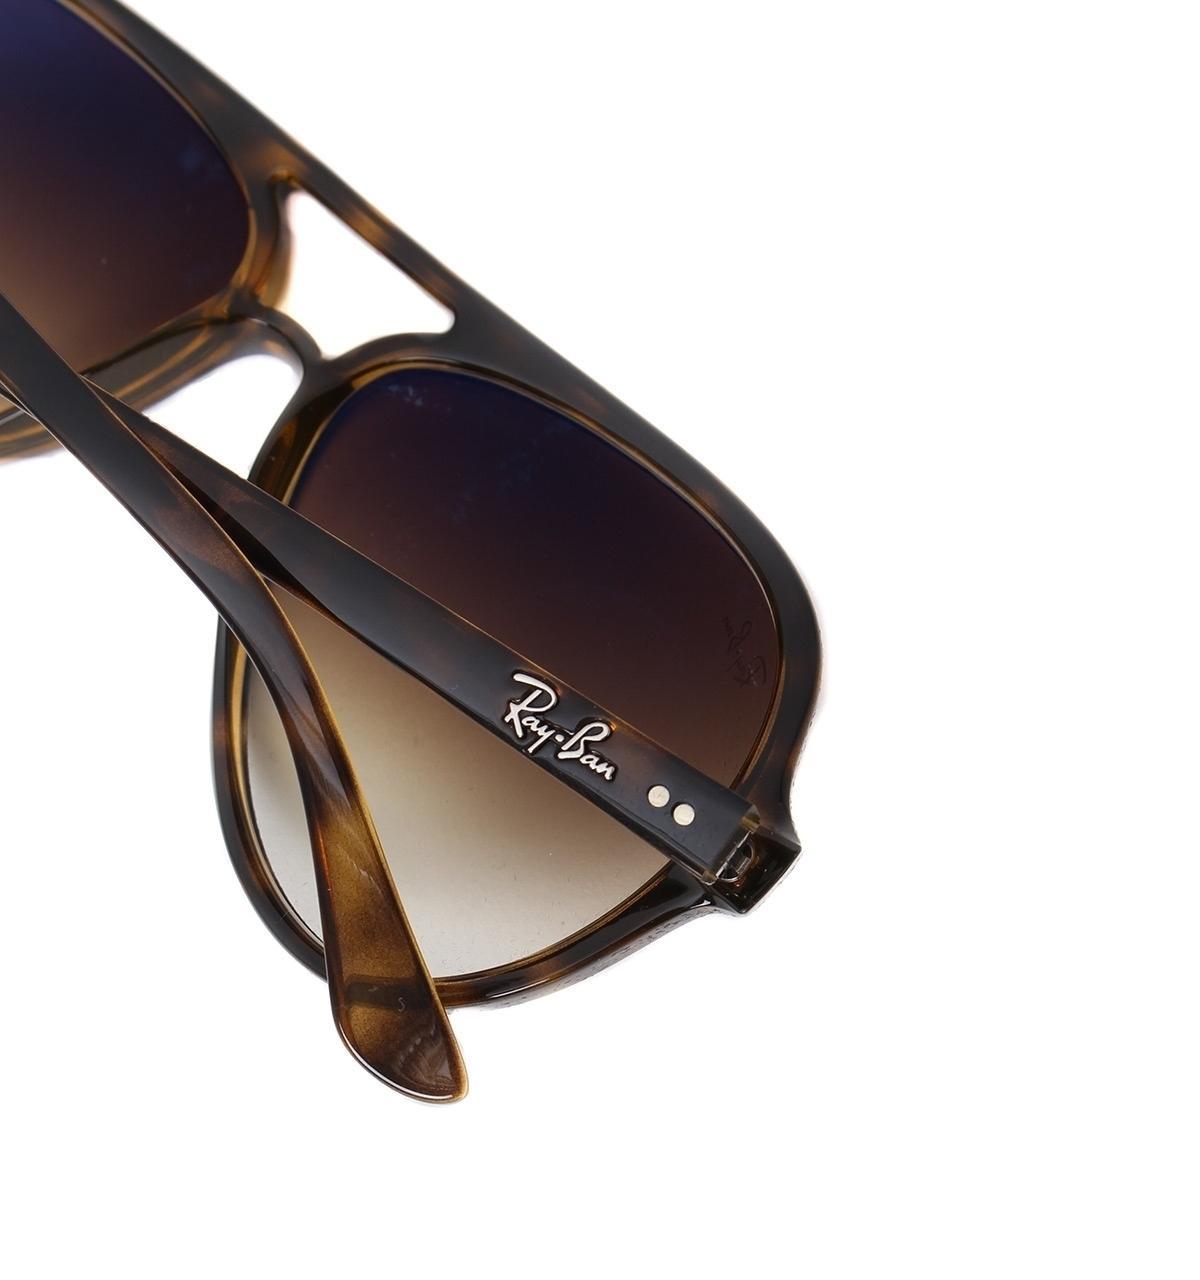 ... Ray Ban Cats 5000 Tortoise Sunglasses for Men - Lyst. View fullscreen a319d7a0c9